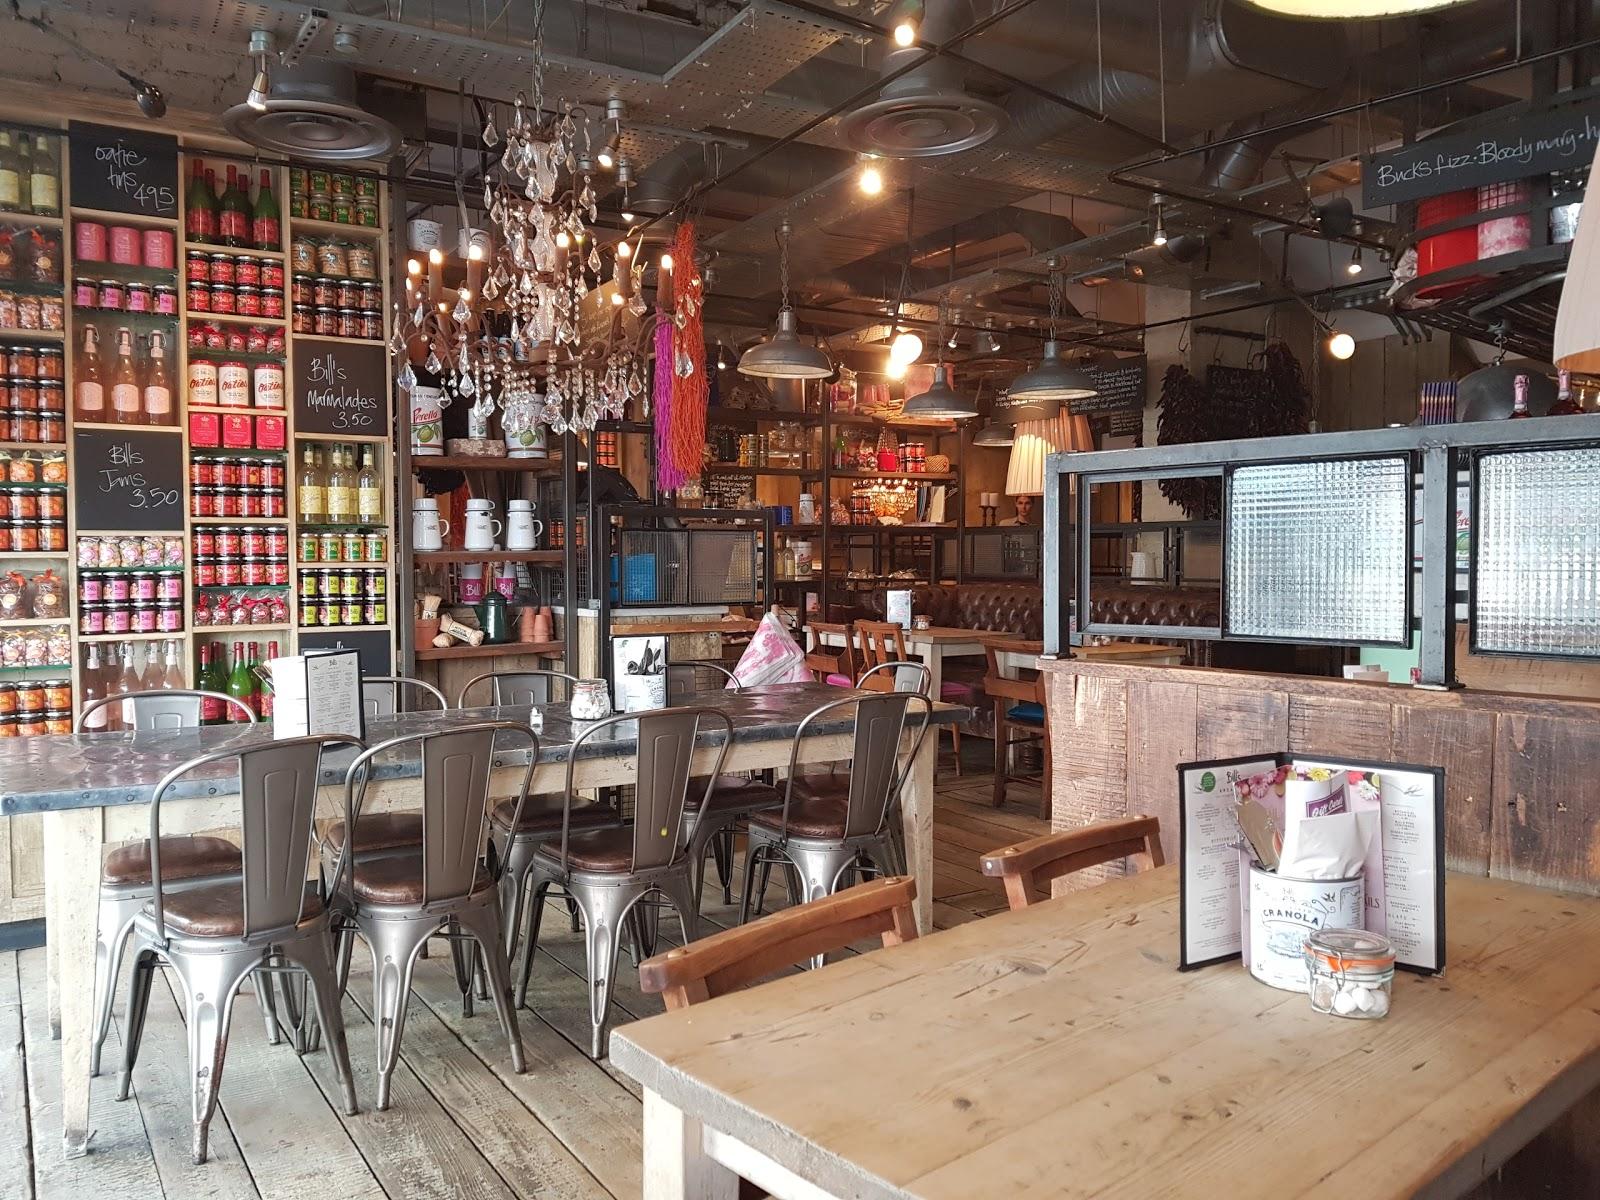 Bill's Putney Restaurant: A Work-Friendly Place in London